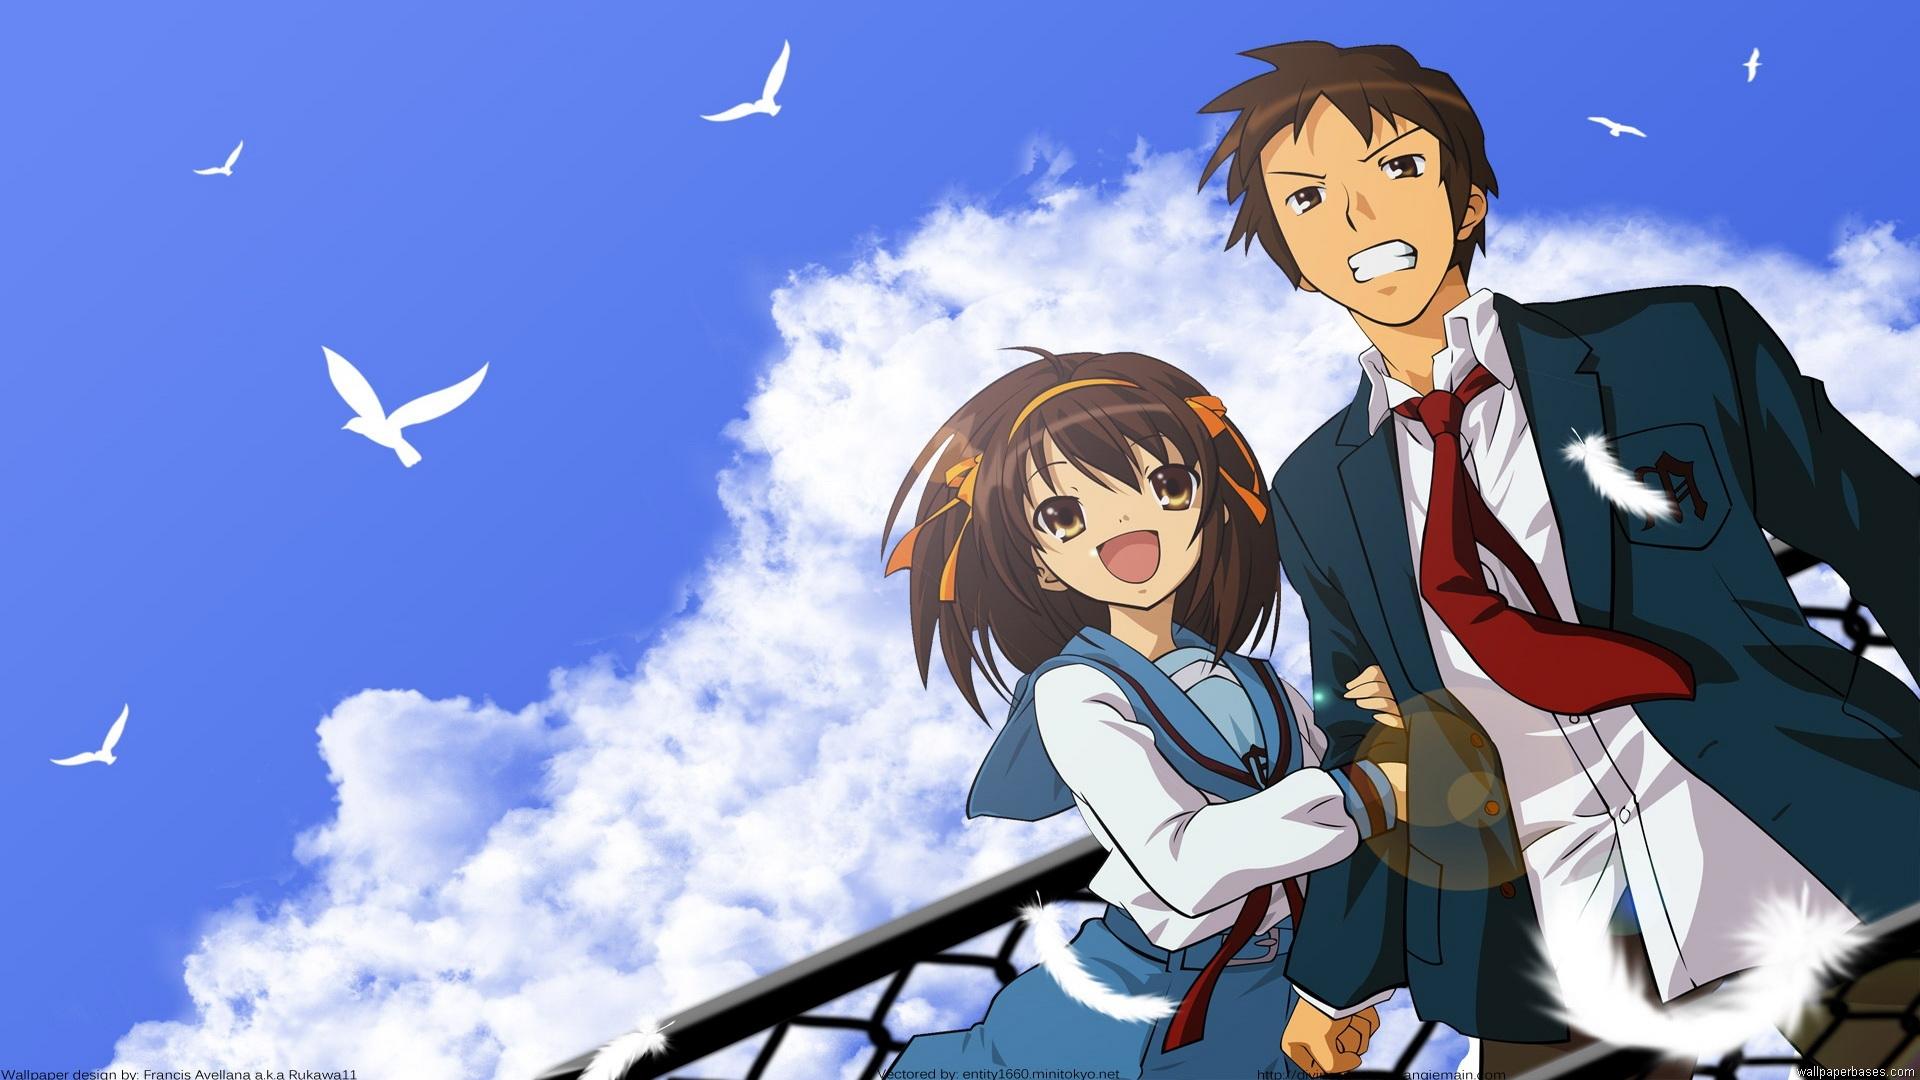 anime hd wallpapers 1080p   wwwhigh definition wallpapercom 1920x1080